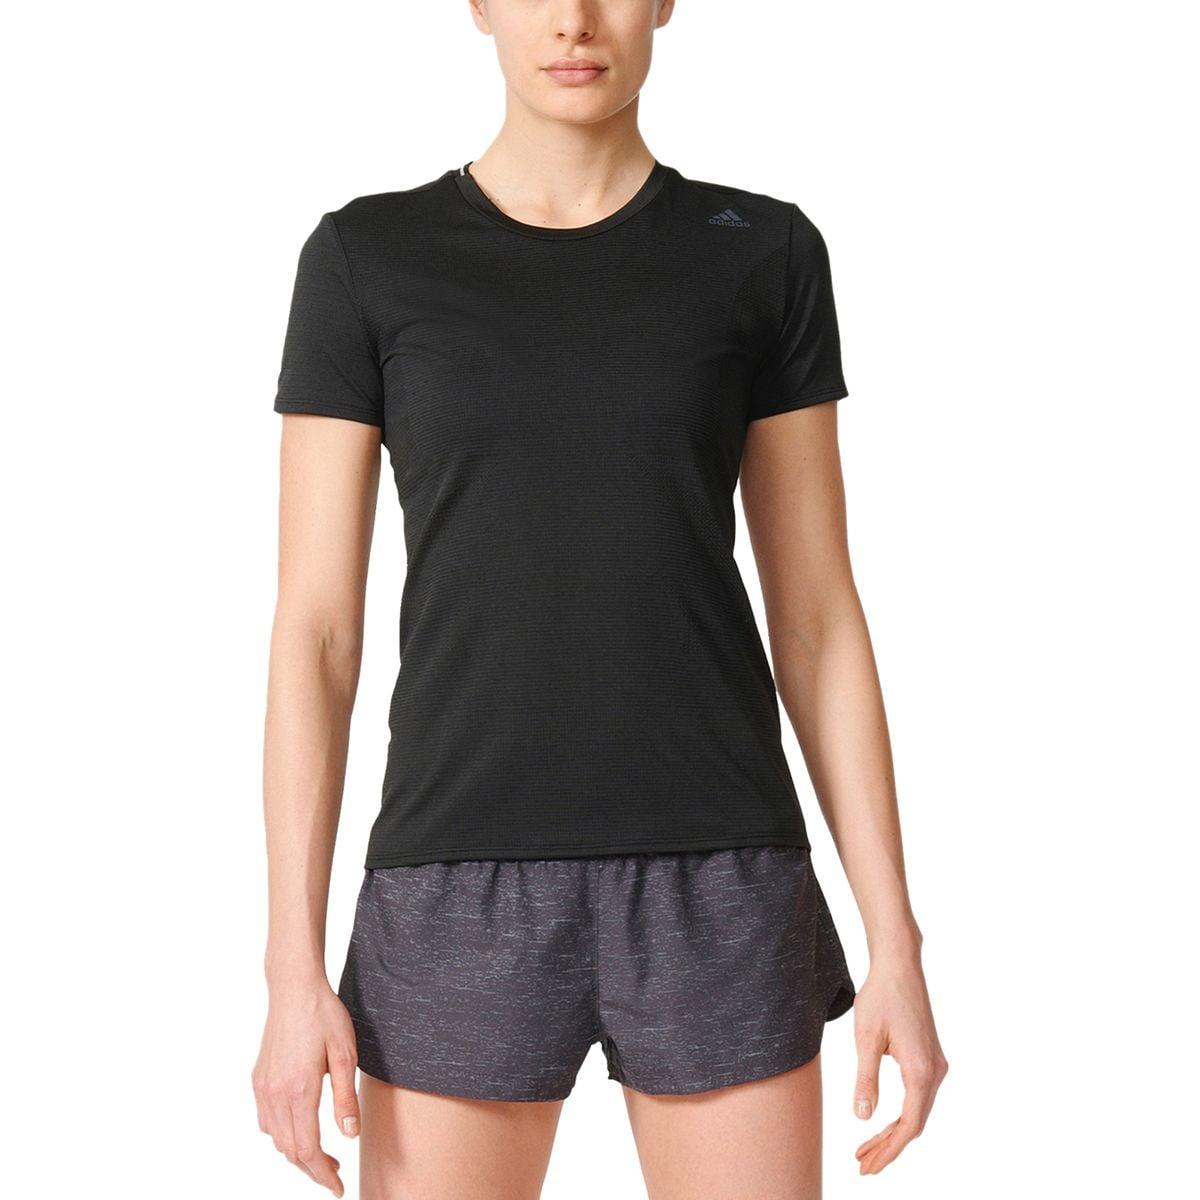 Adidas Supernova Short-SleeveT-Shirt - Women